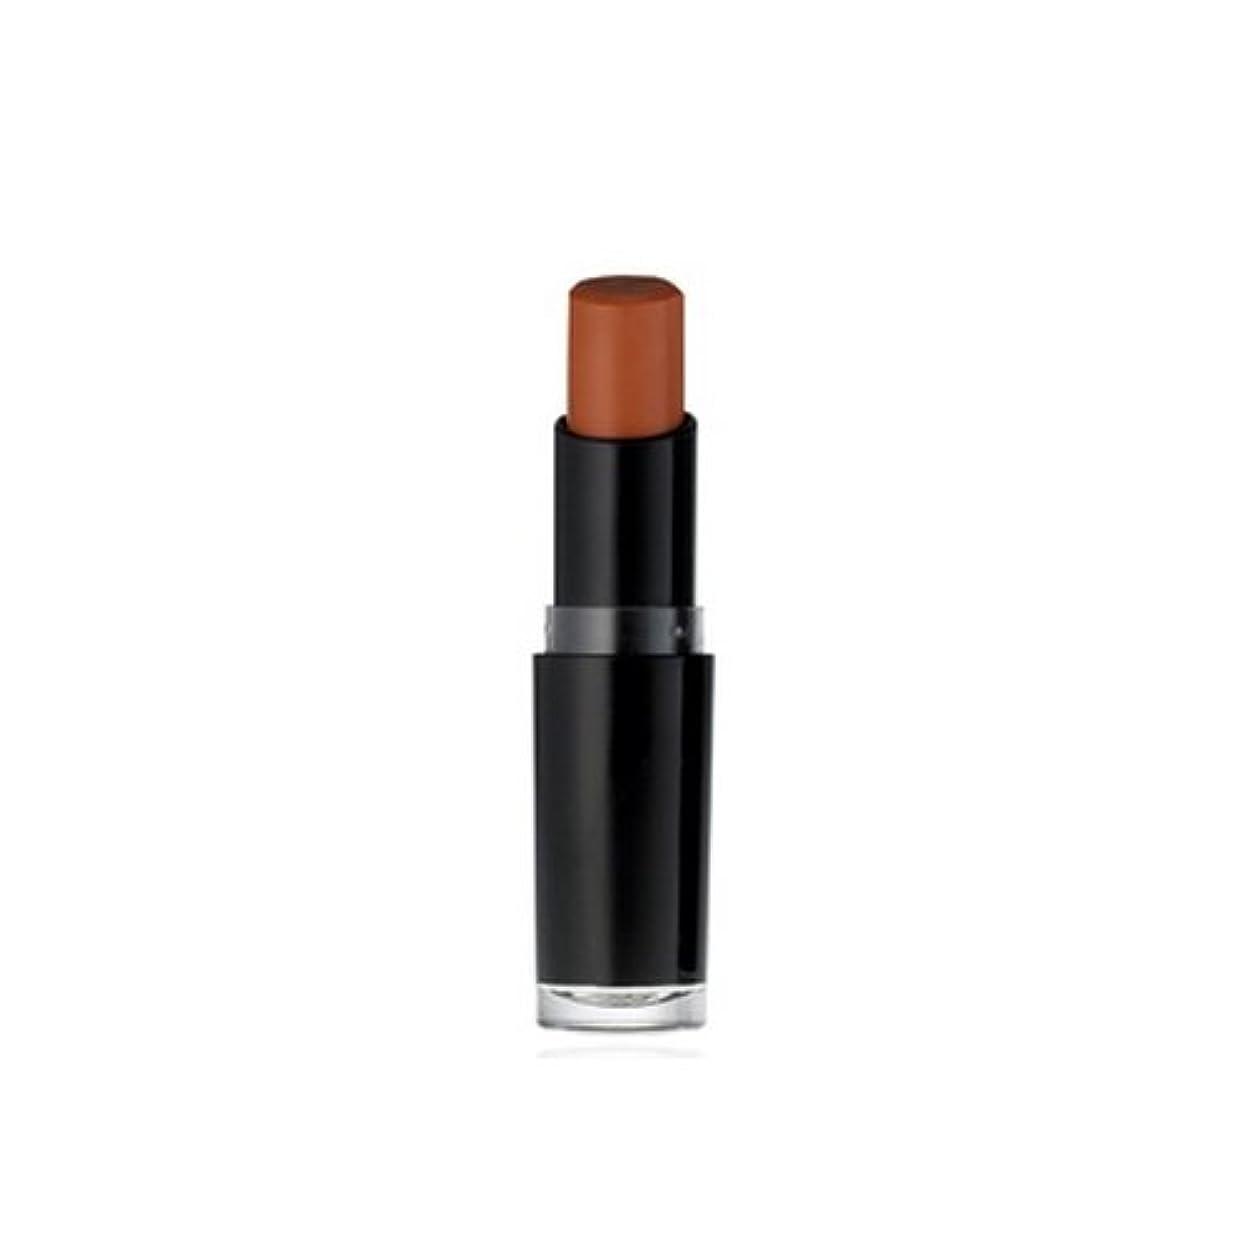 WET N WILD Mega Last Matte Lip Cover - Bare It All (並行輸入品)